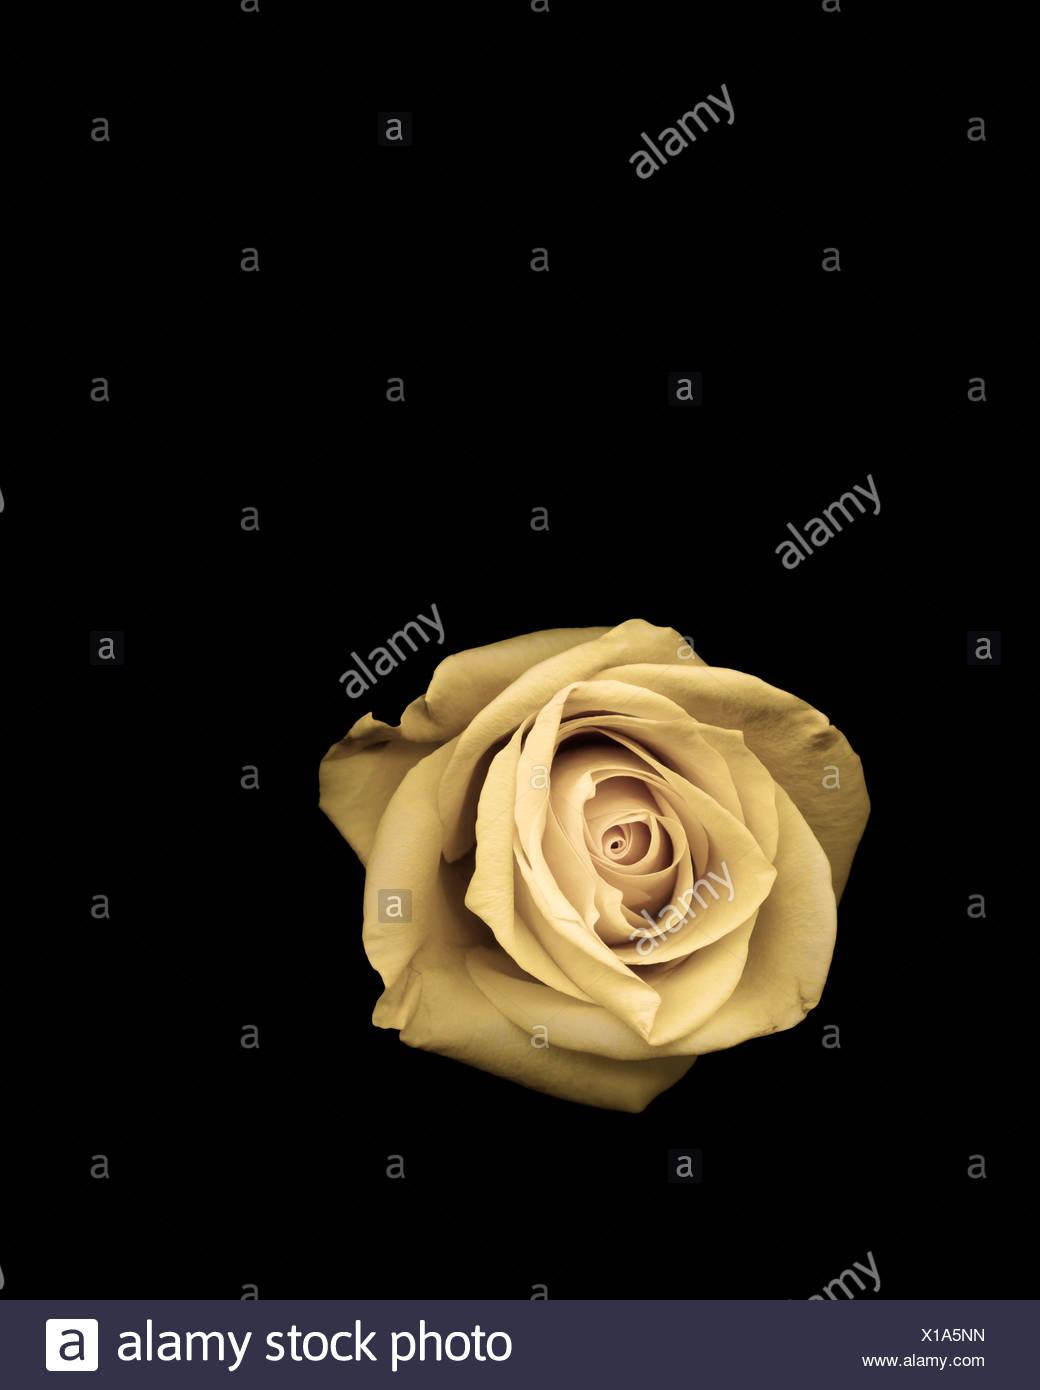 Studio shot of rose - Stock Image